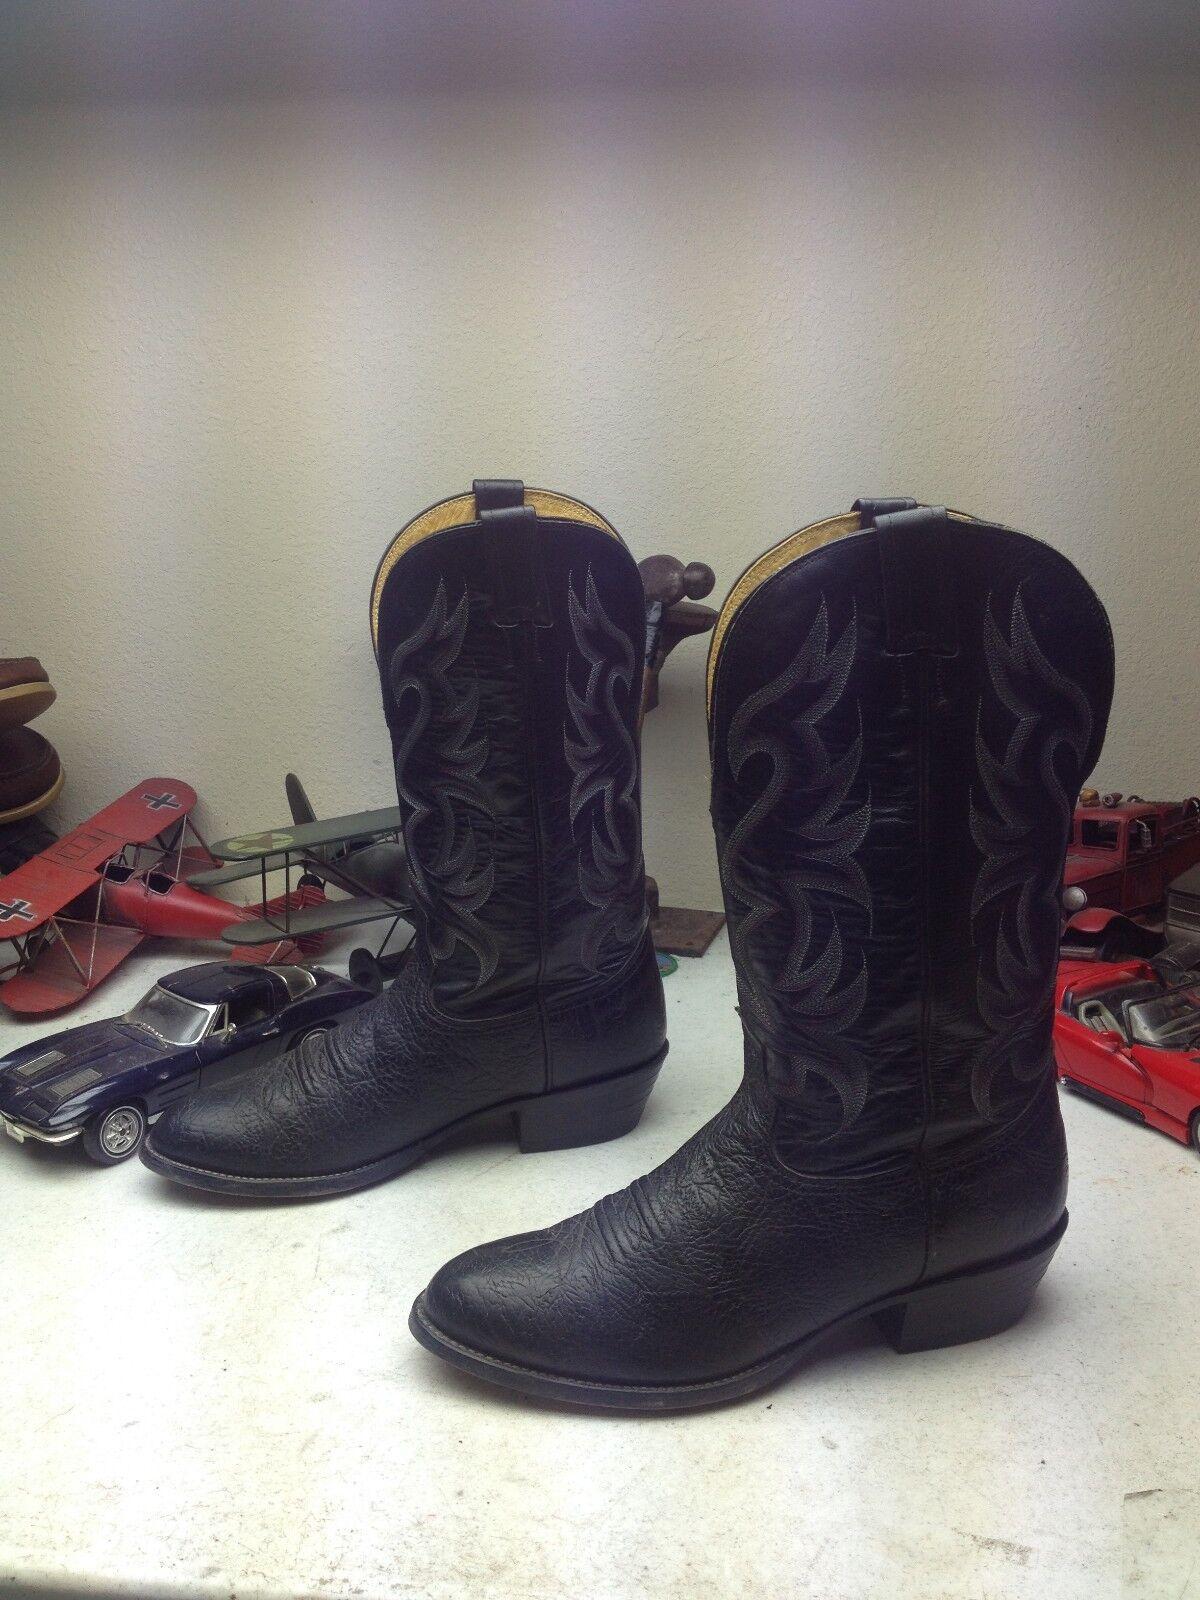 NOCONA DISTRESSED USA BLACK BLACK BLACK LEATHER WESTERN COWBOY BOOTS 10EE 3b9c37